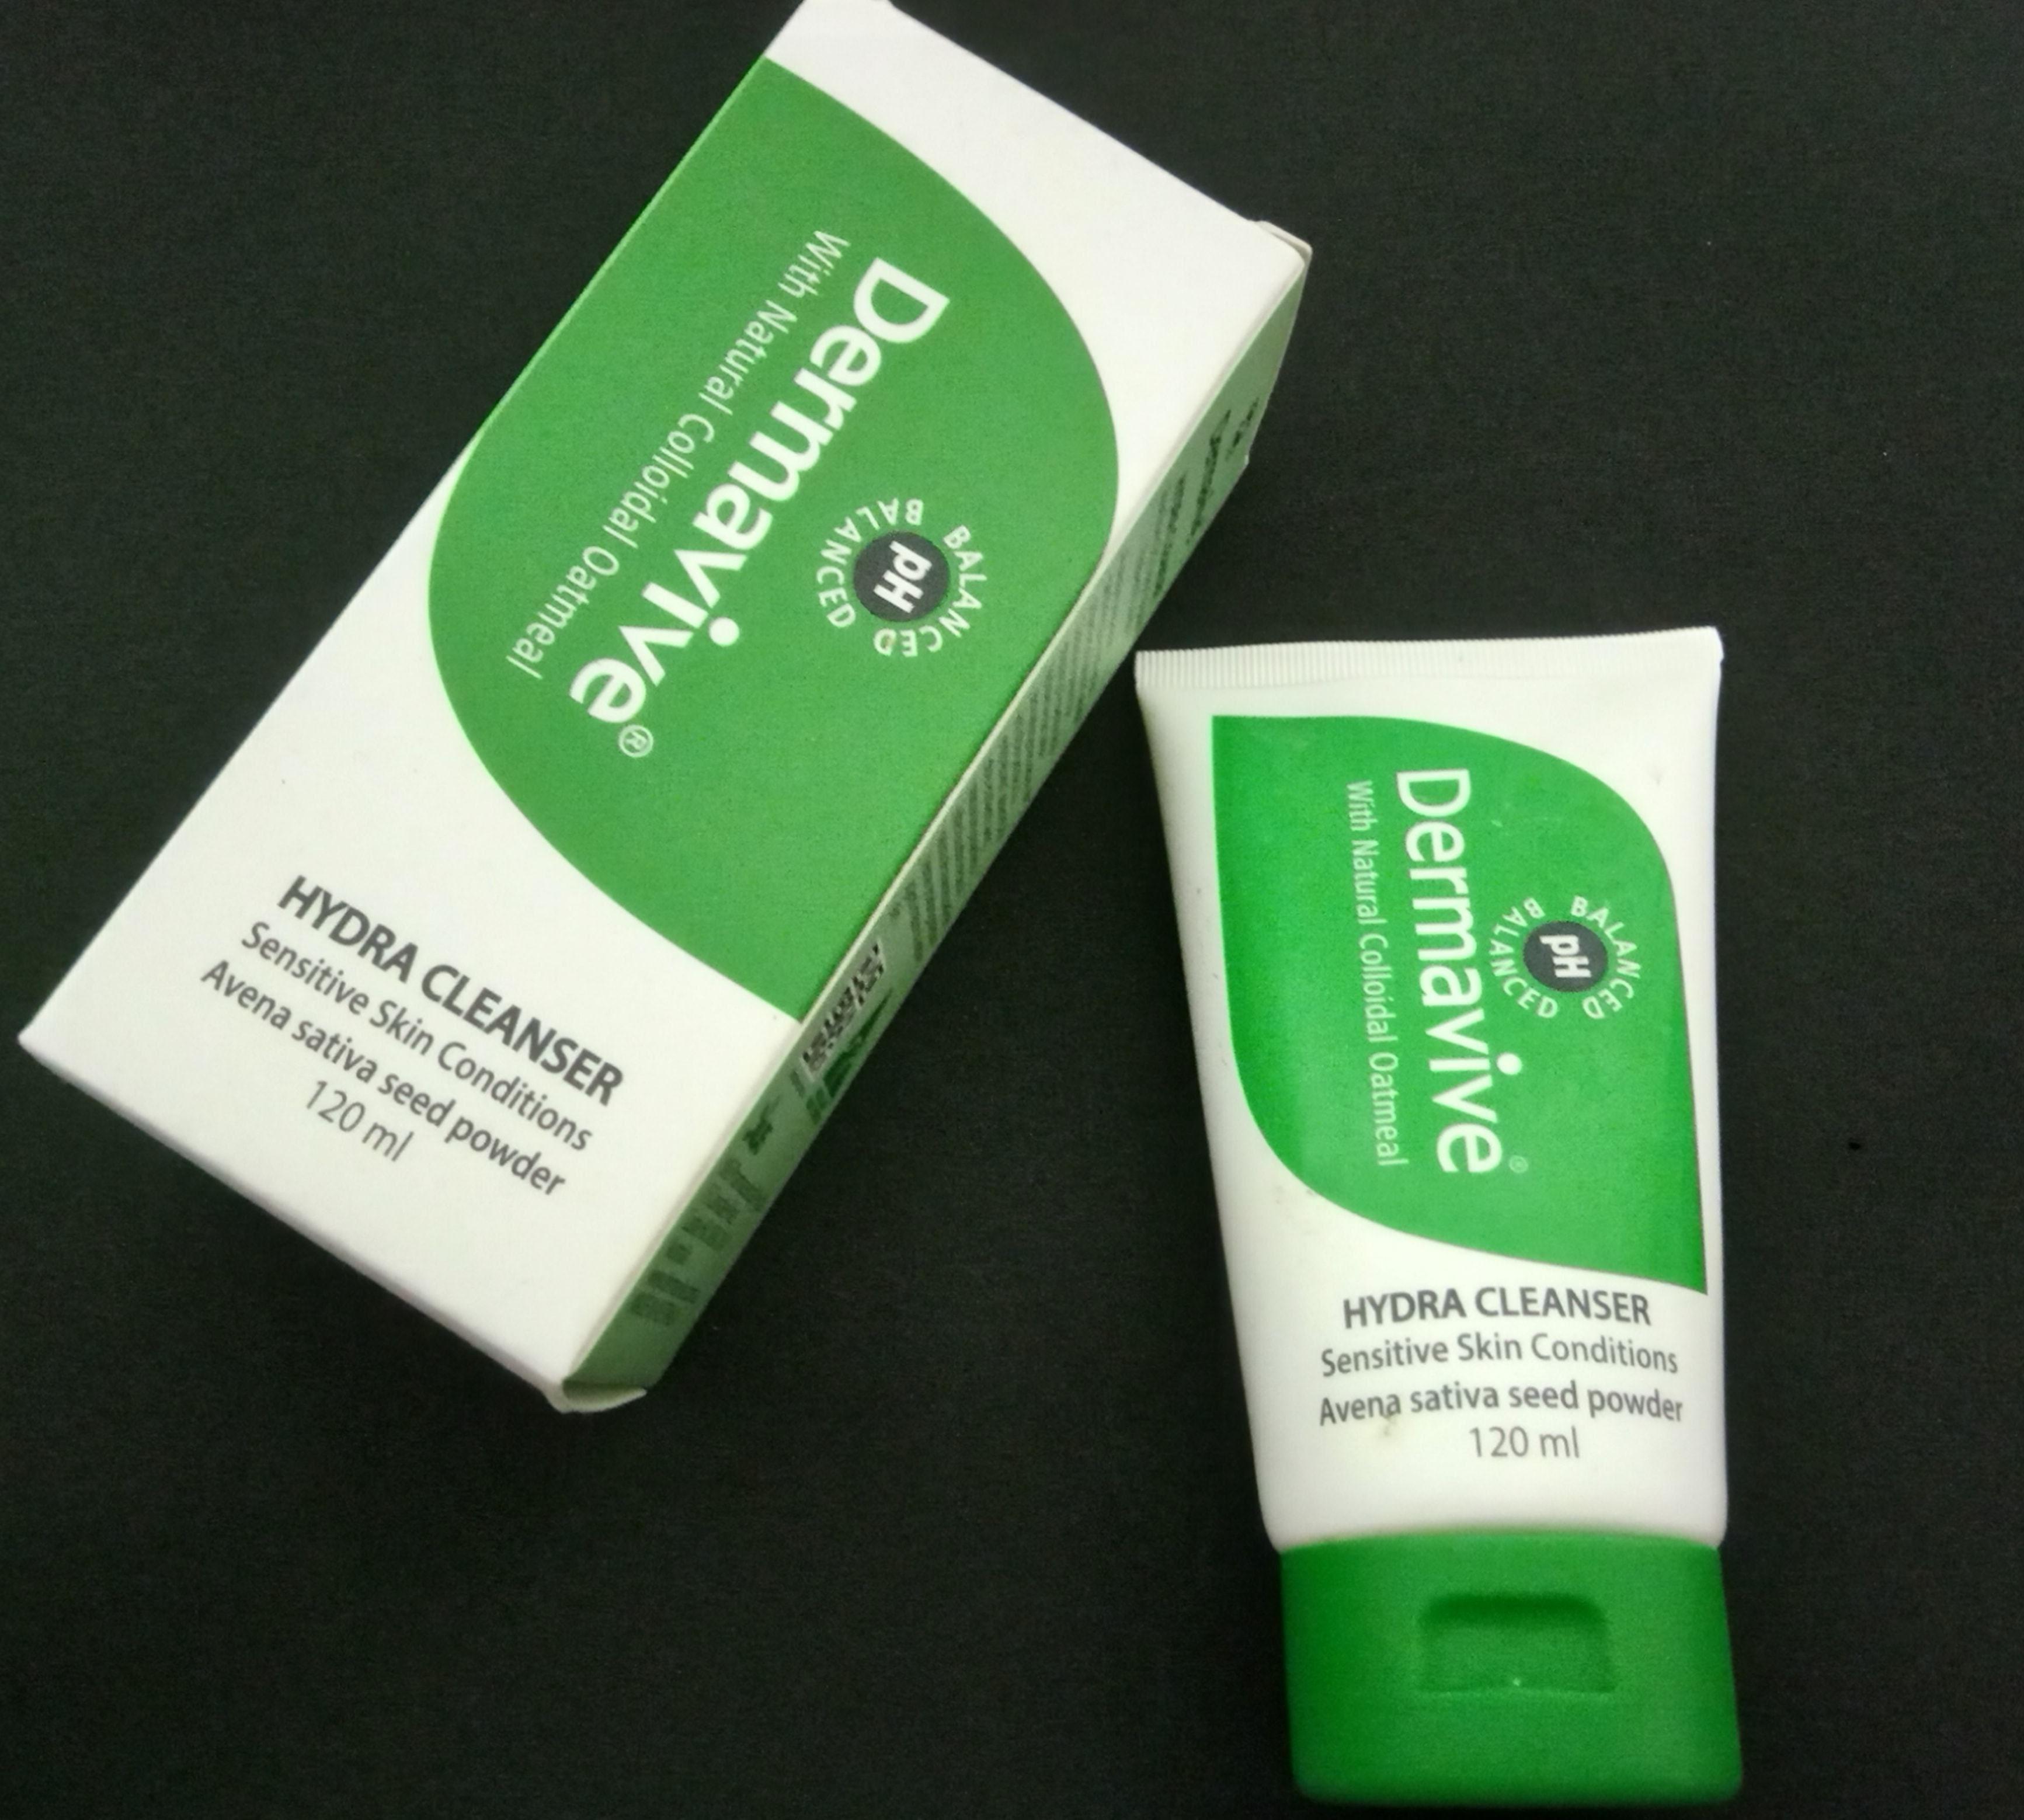 Dermavive Hydra Cleanser Cleanser sensitive skin